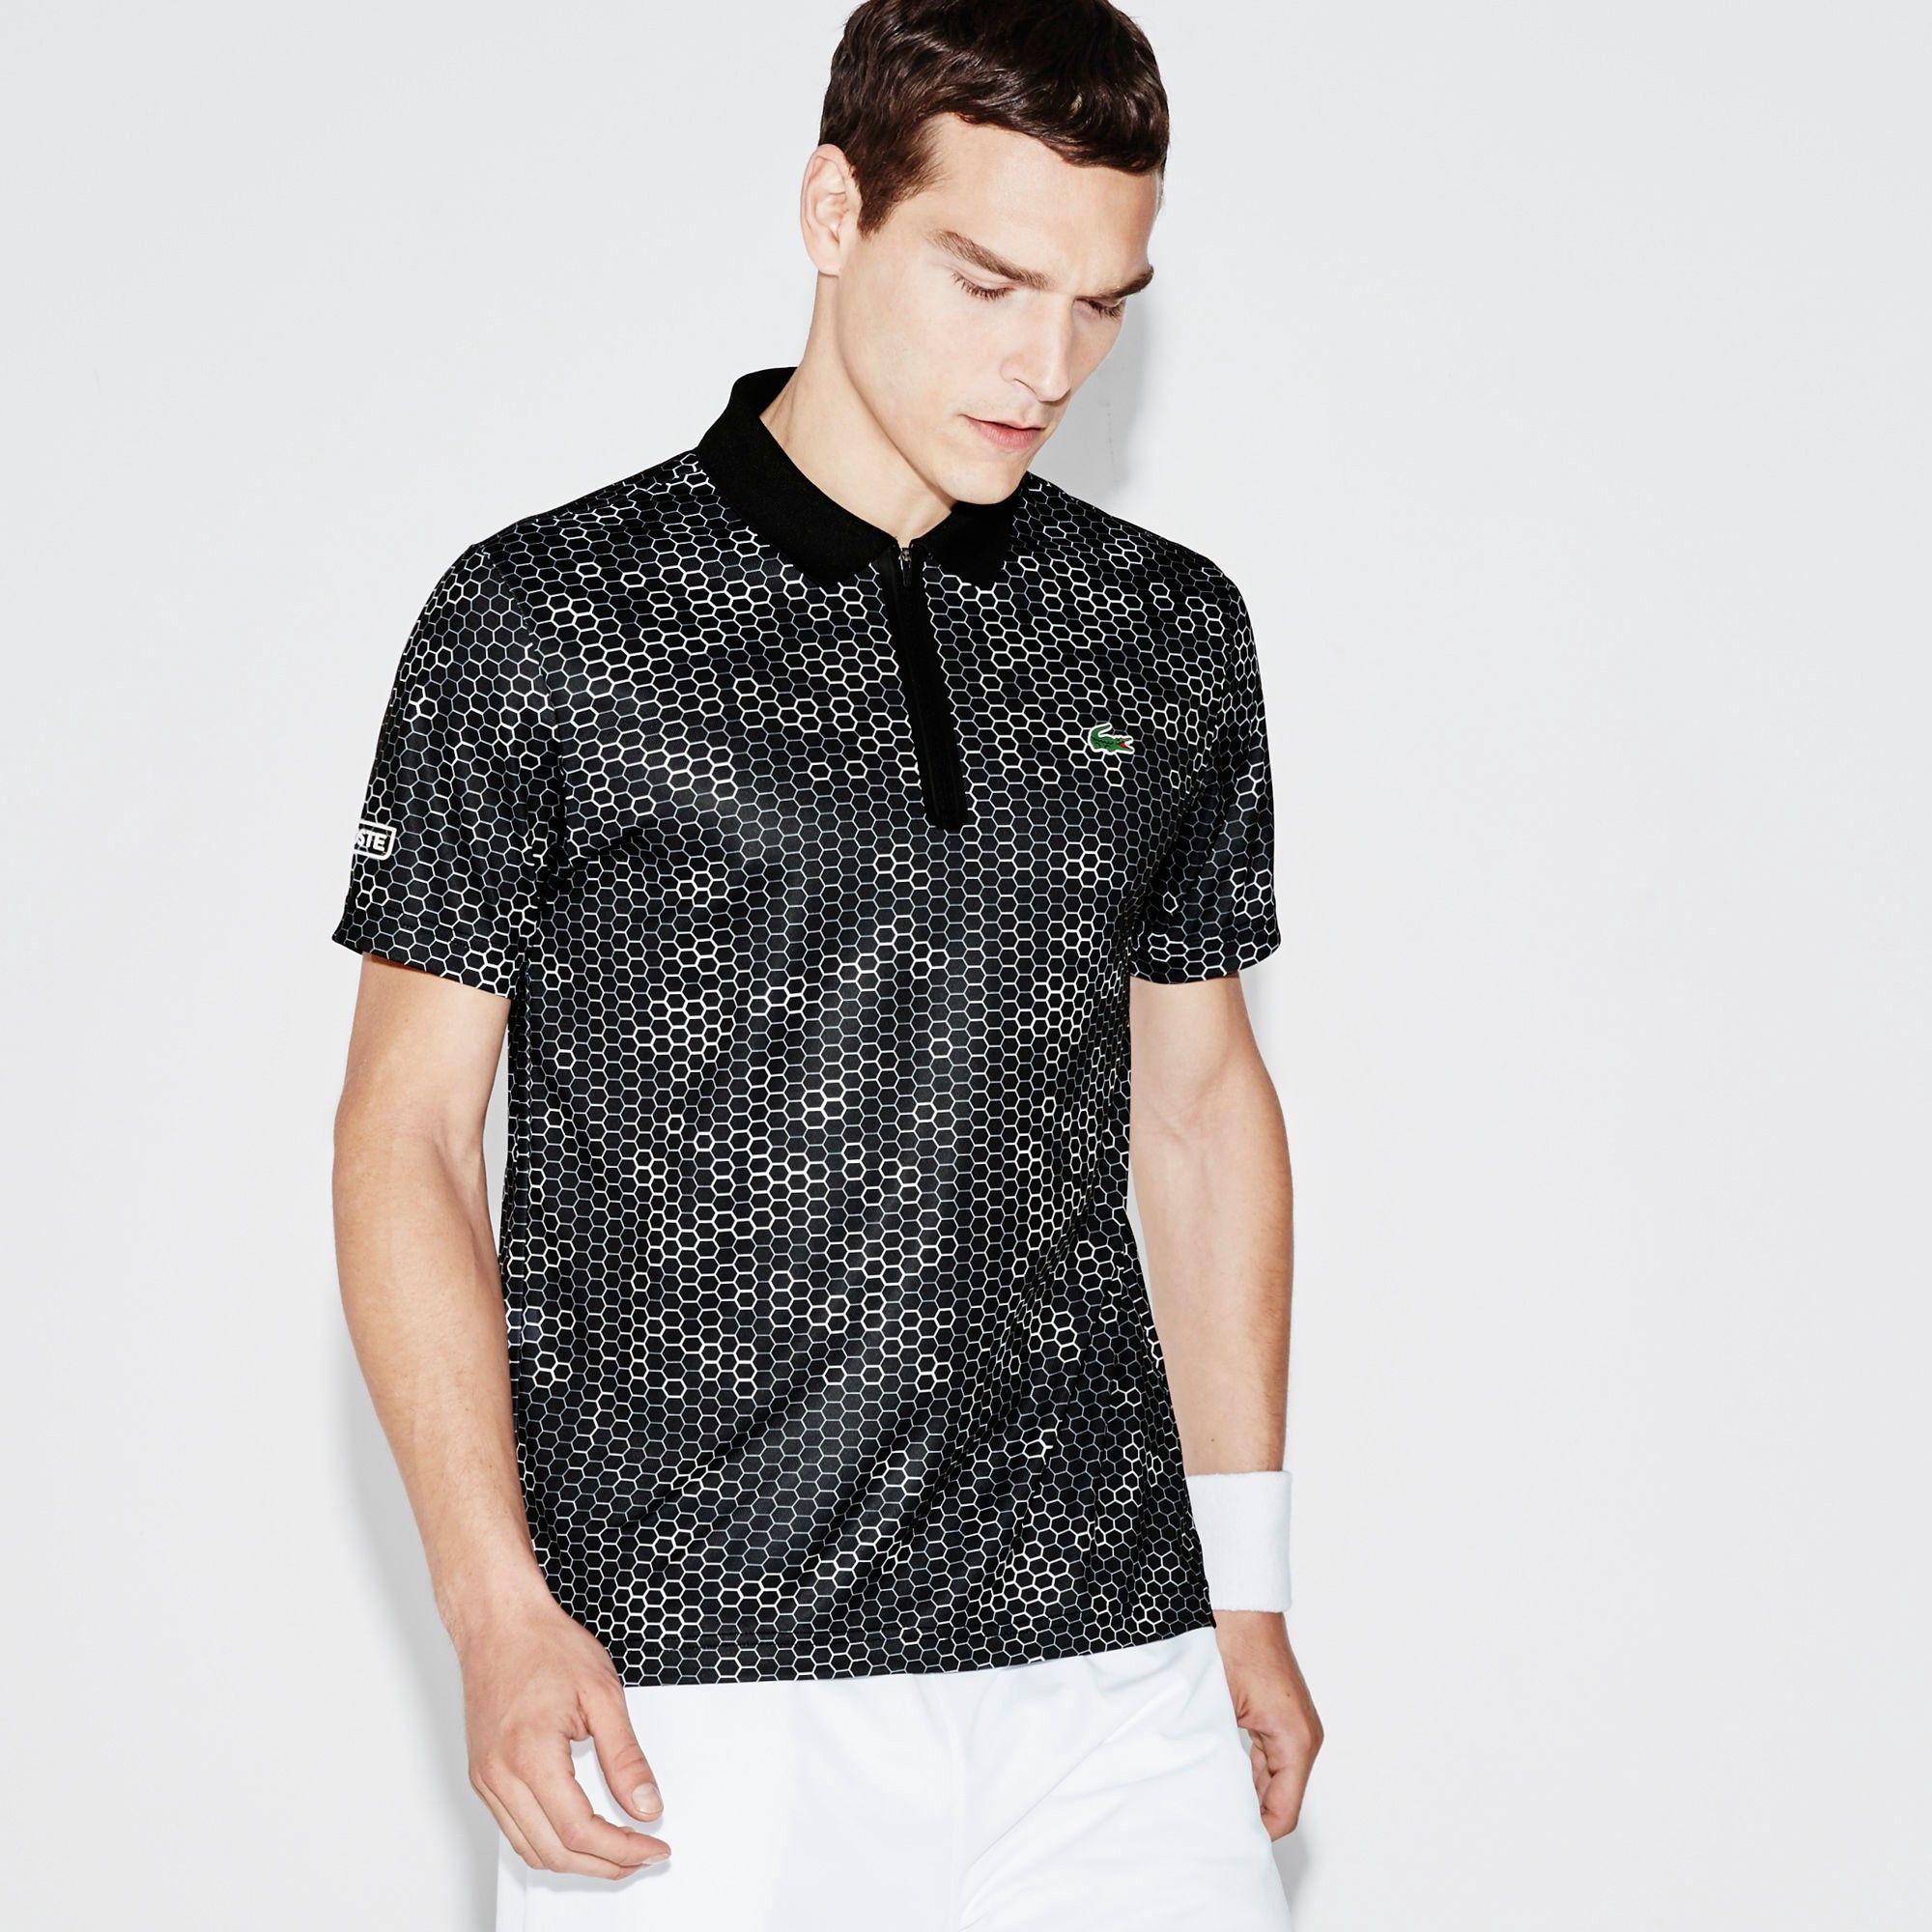 d29471011ba LACOSTE Men s SPORT Ultra Dry Zip Tennis Polo Shirt - black white ...